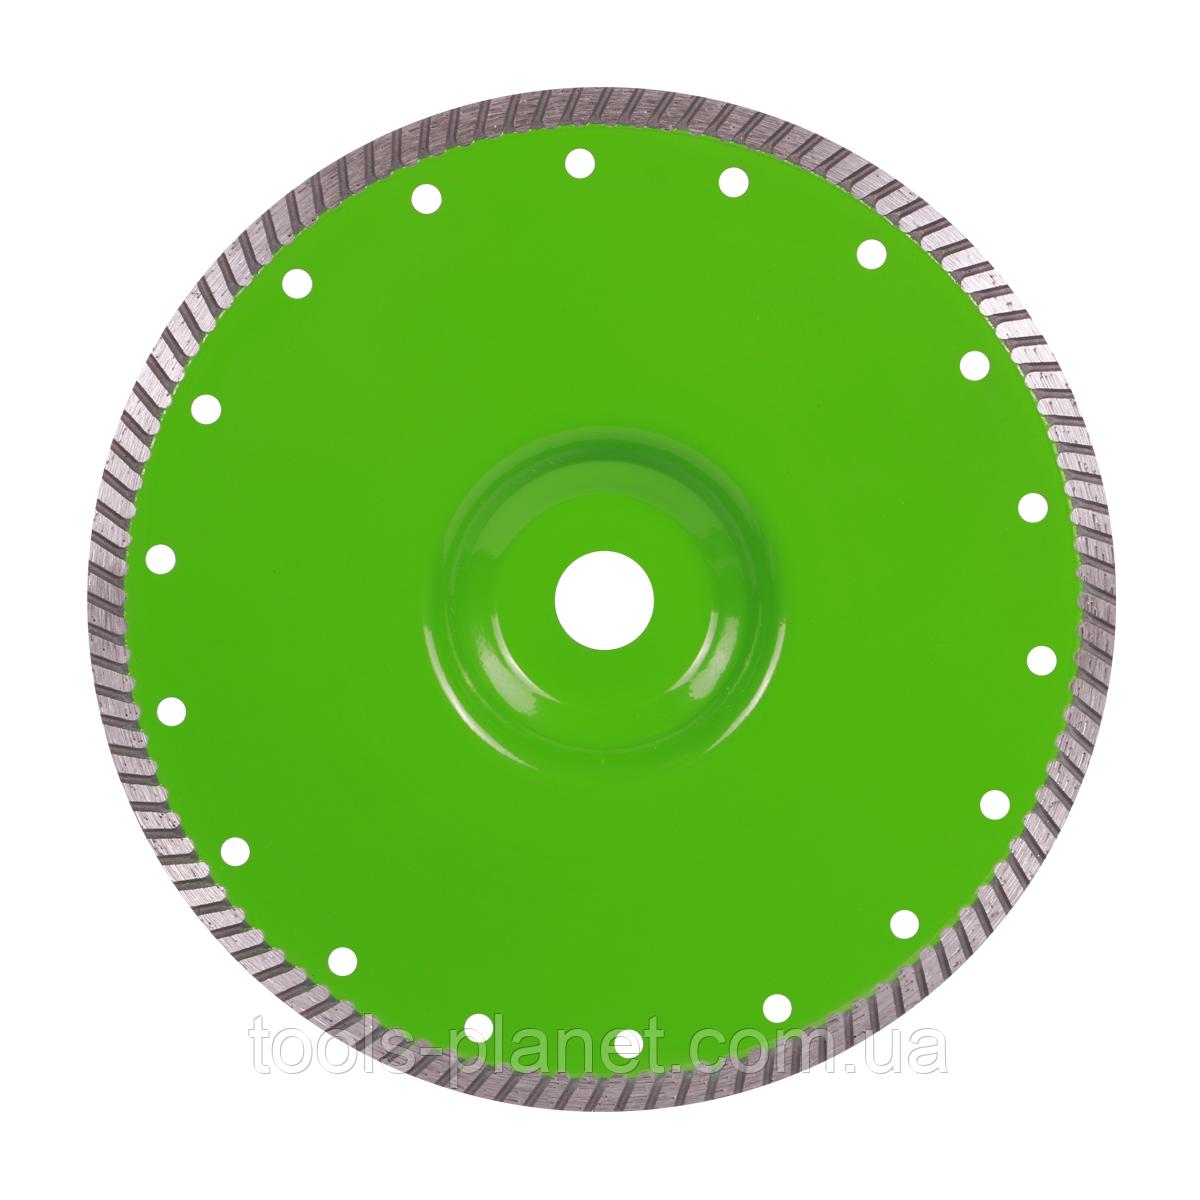 Алмазний диск Distar 1A1R Turbo 230 x 2,6 x 9 x 22,23 / F Elite Active 5D (10216025017)